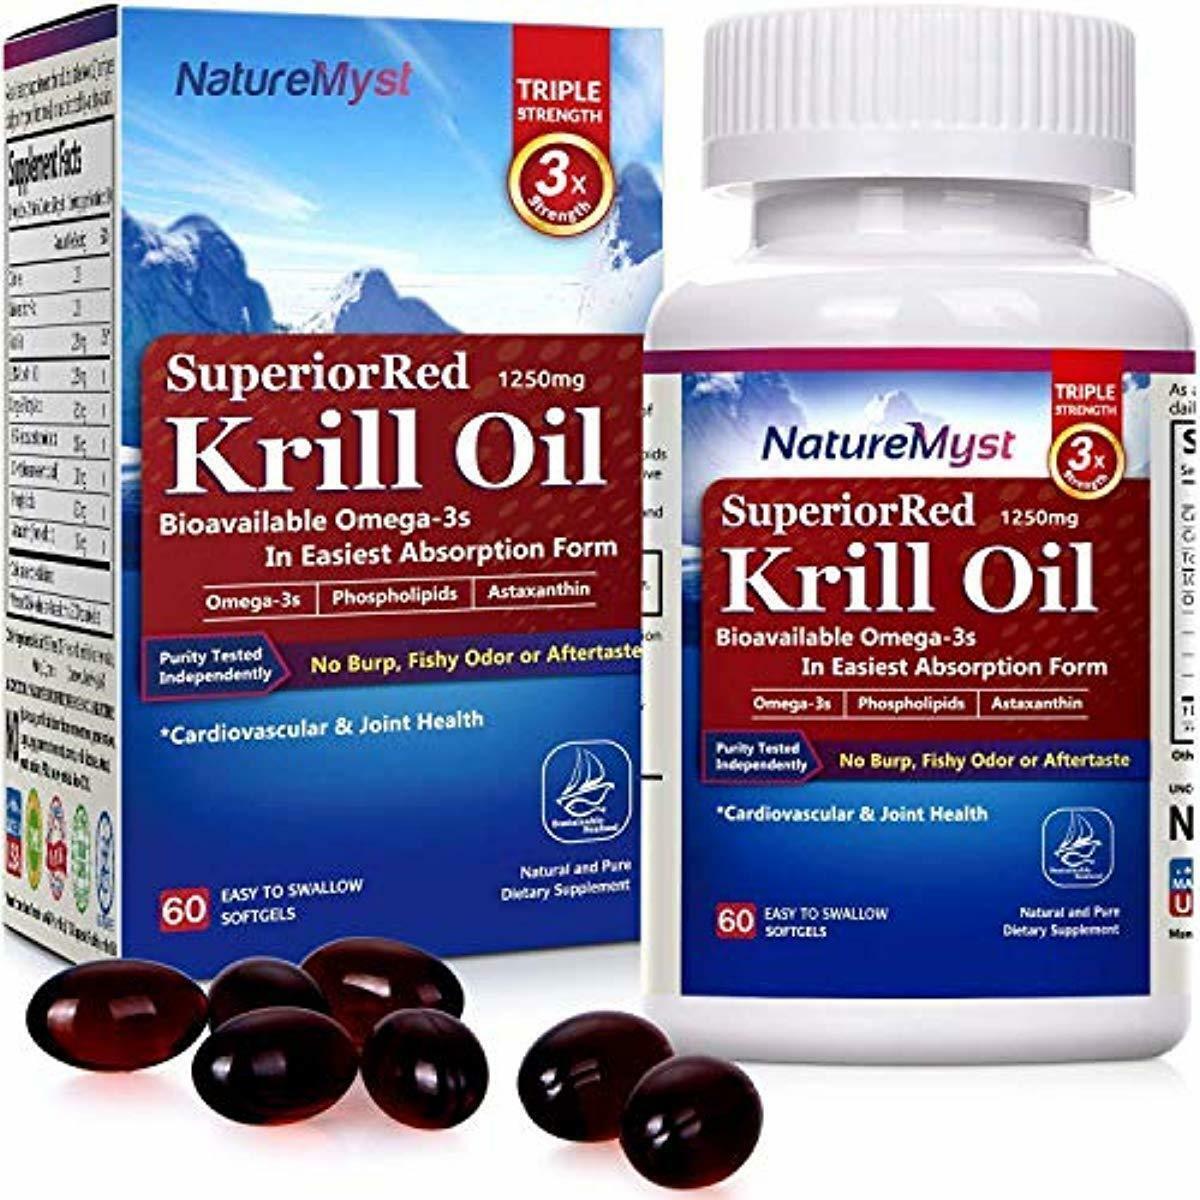 NatureMyst Krill Oil, 1250mg, Professional Grade 60 Liquid S